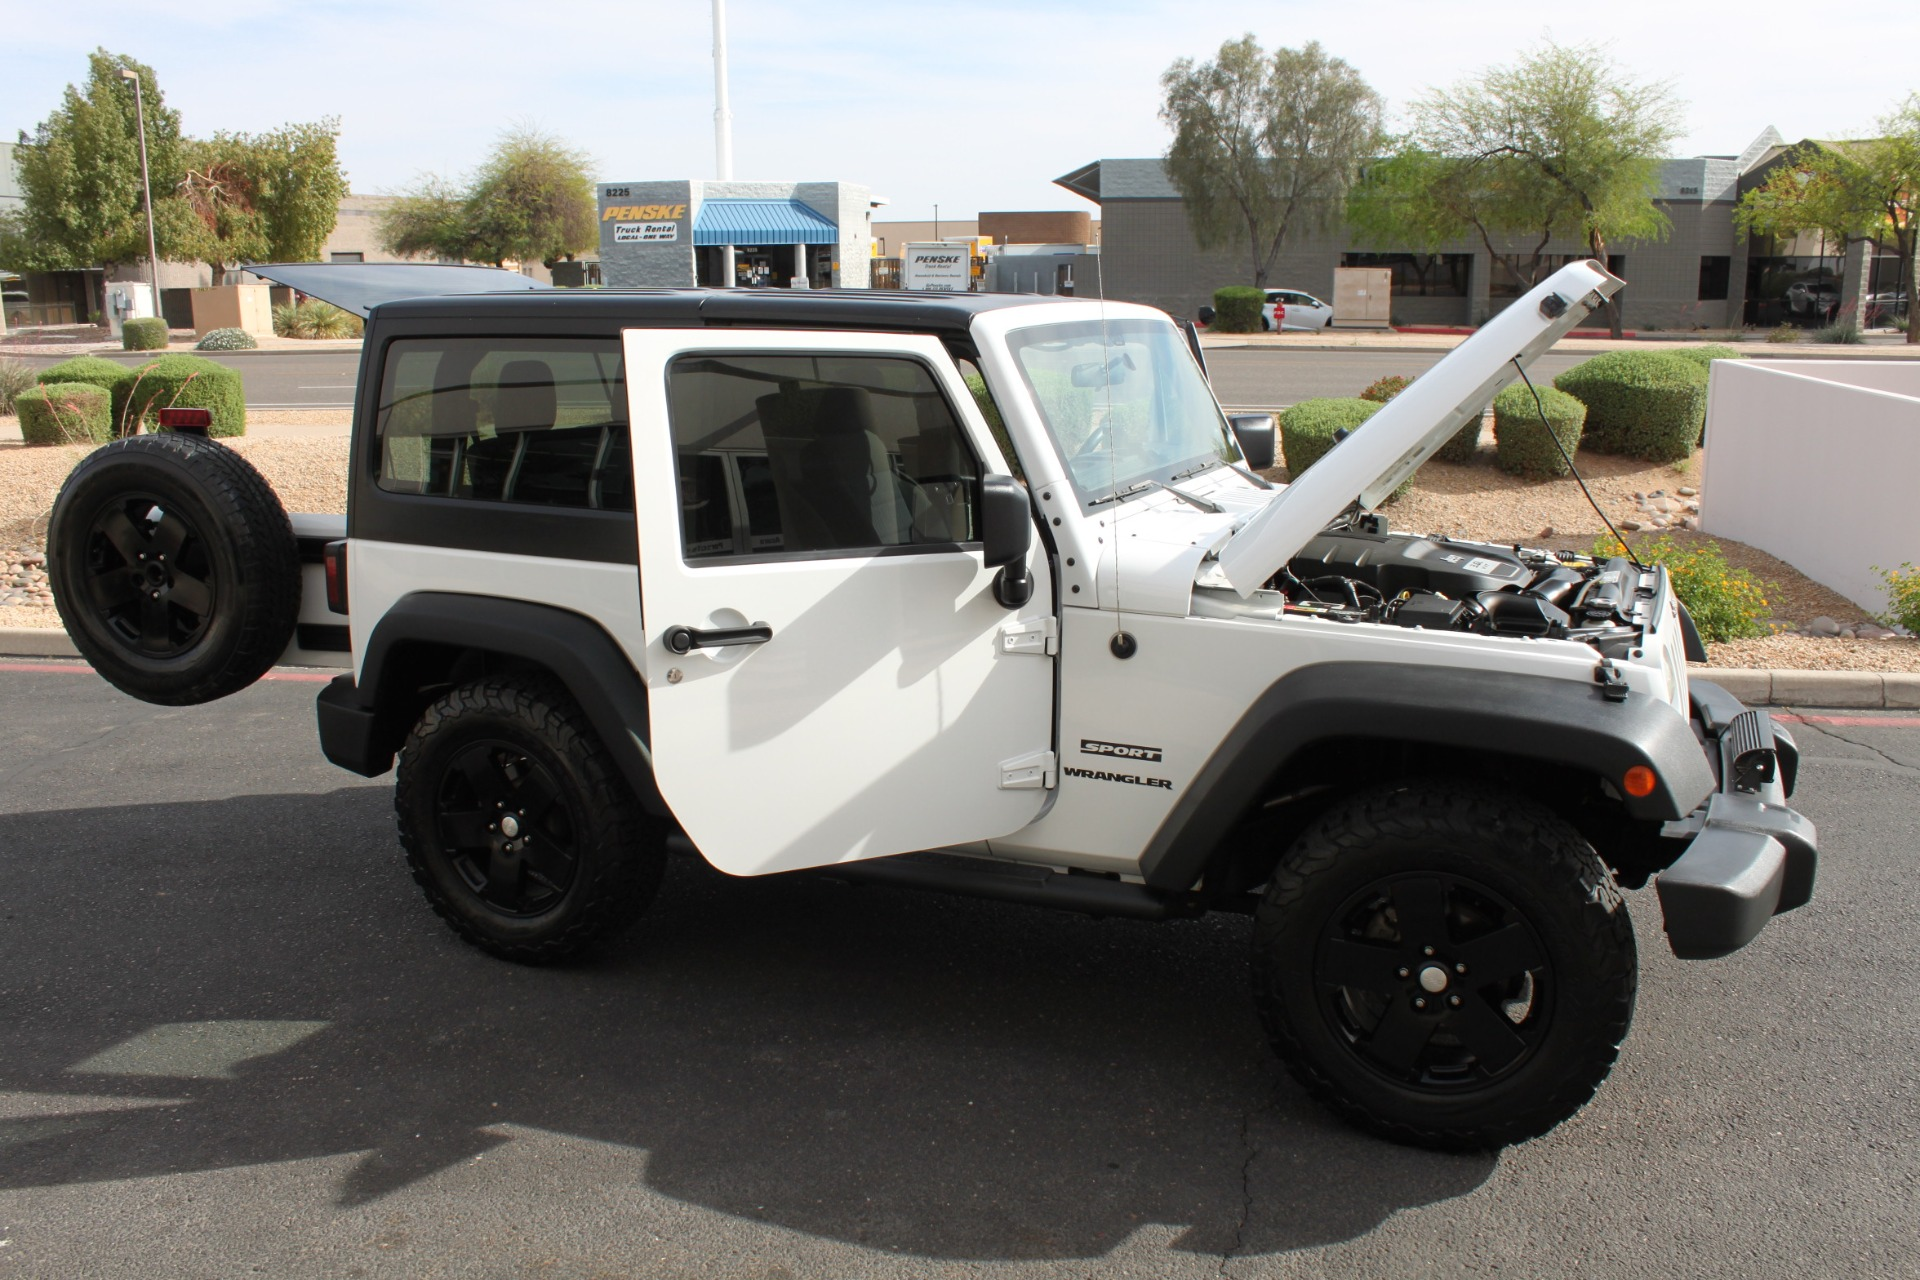 Used-2012-Jeep-Wrangler-Freedom-Edition-4X4-LS430